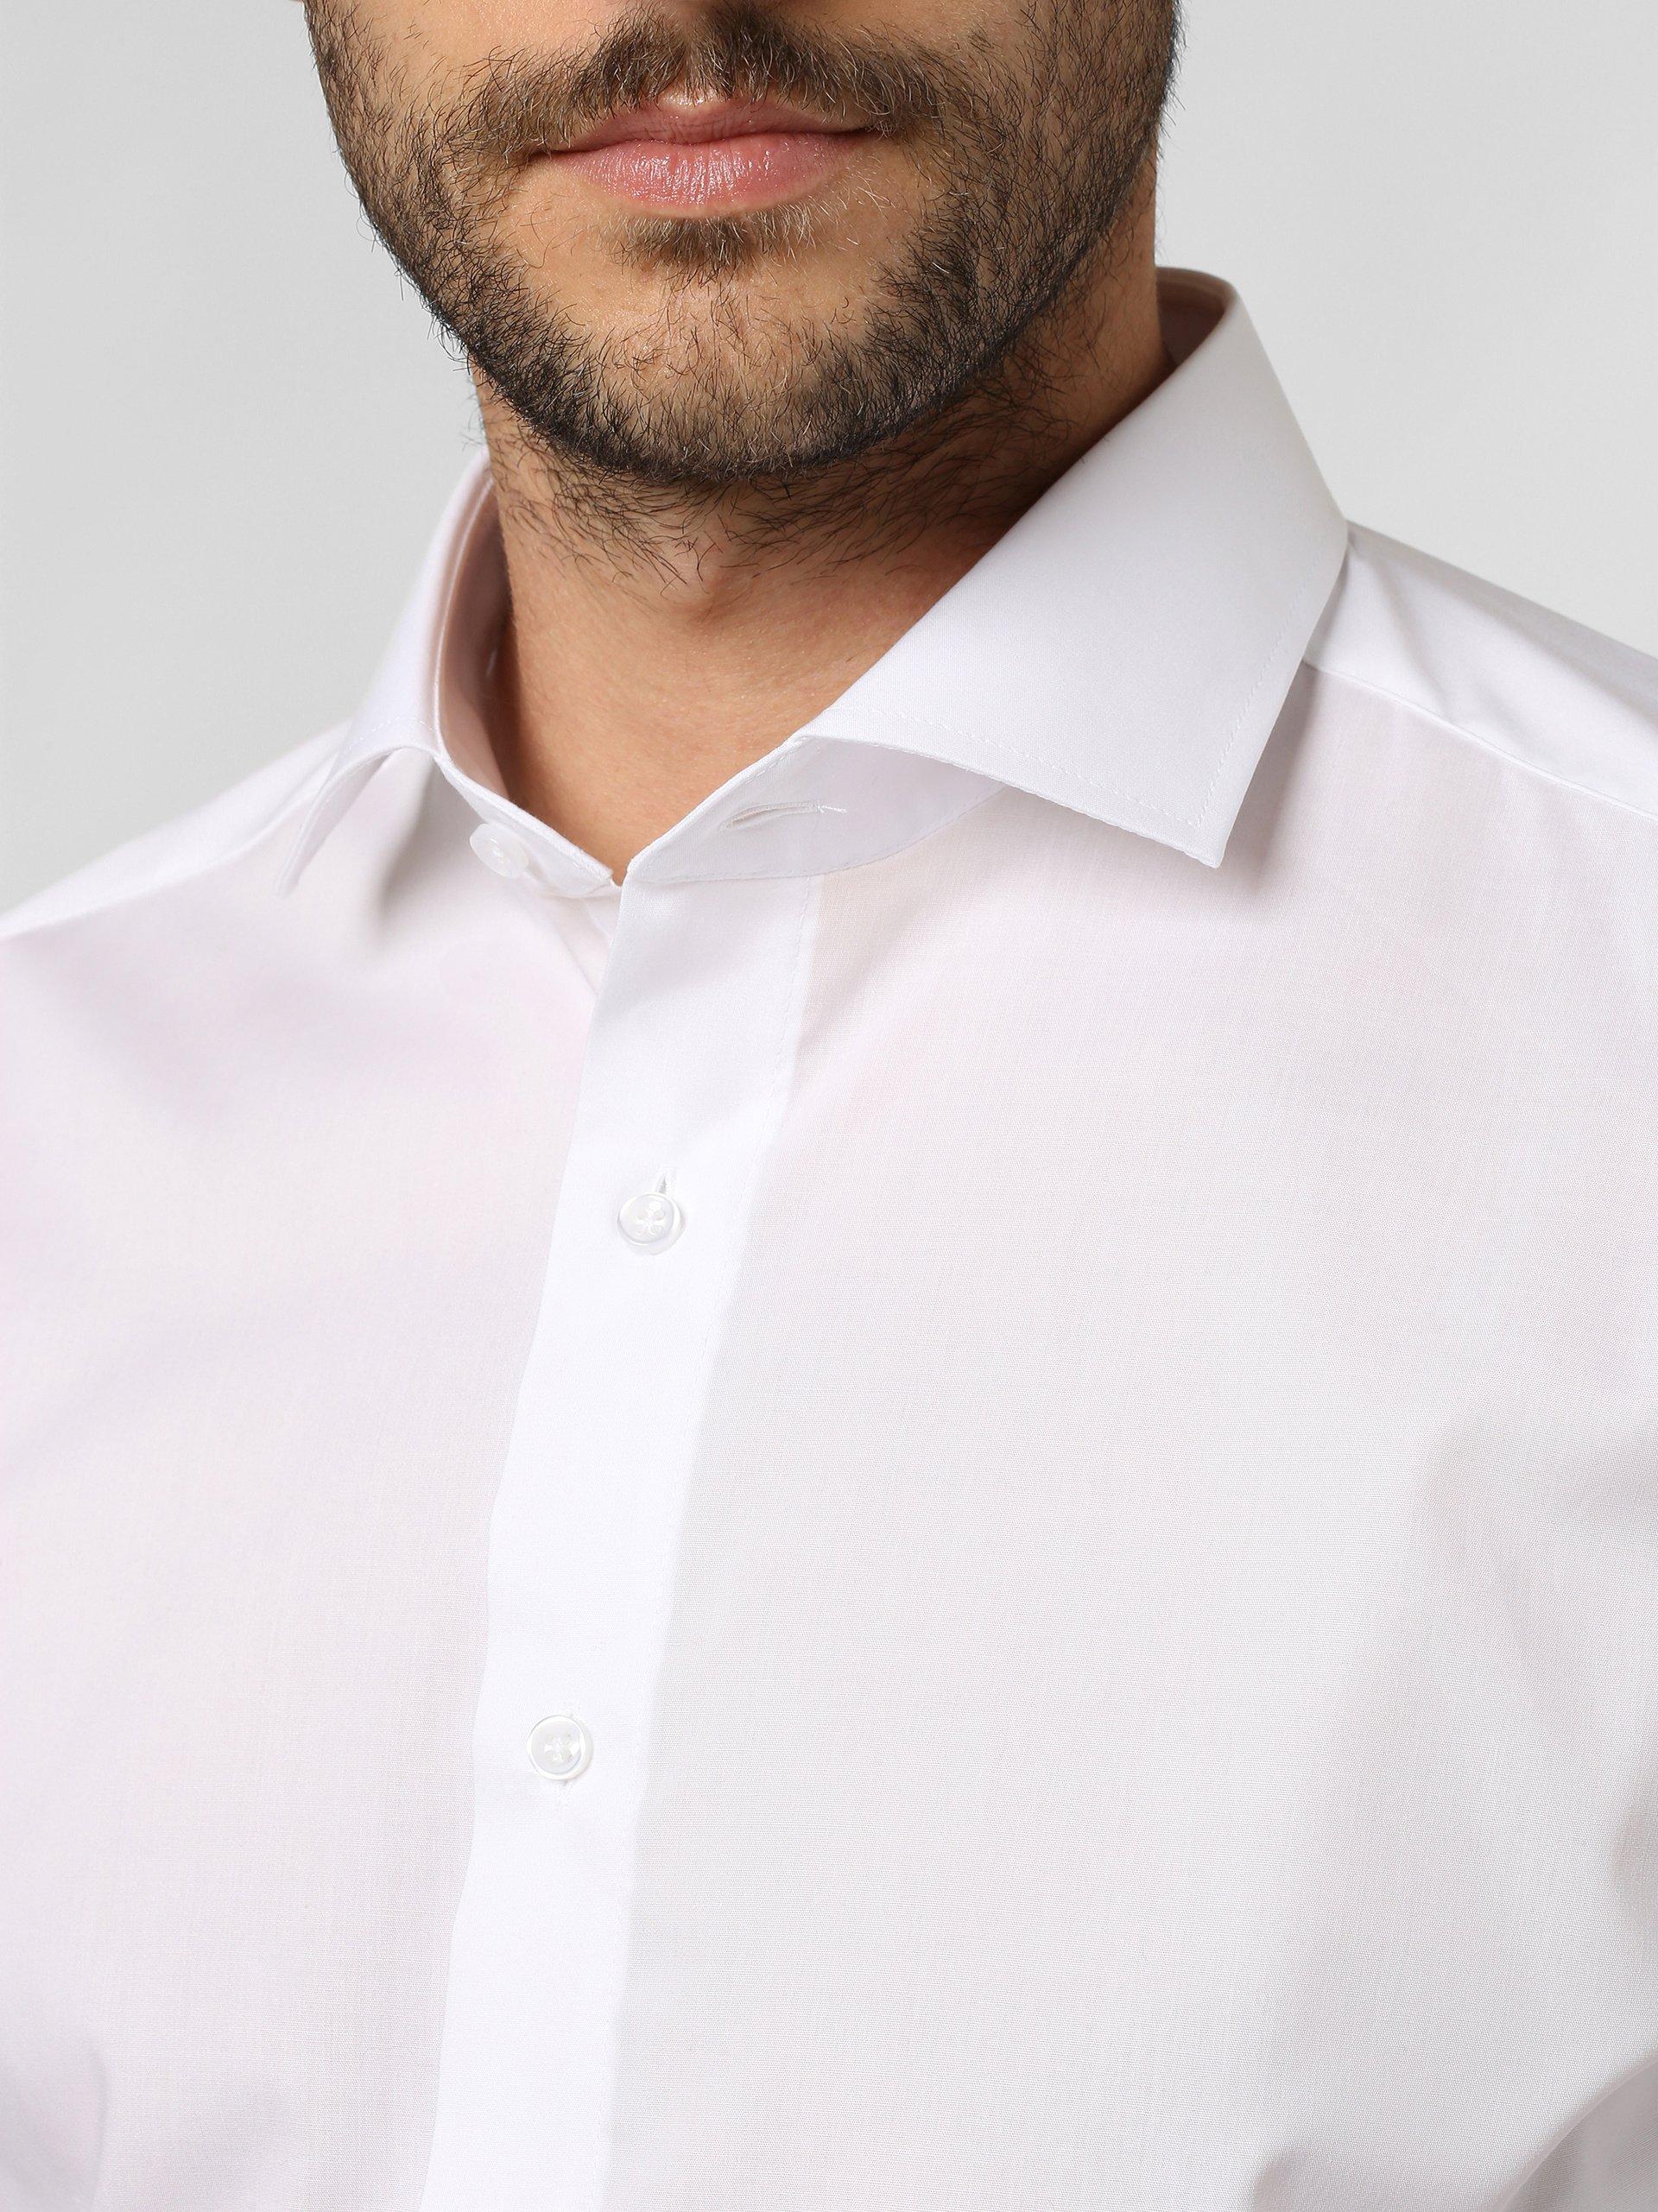 Andrew James New York Koszula męska – Barney